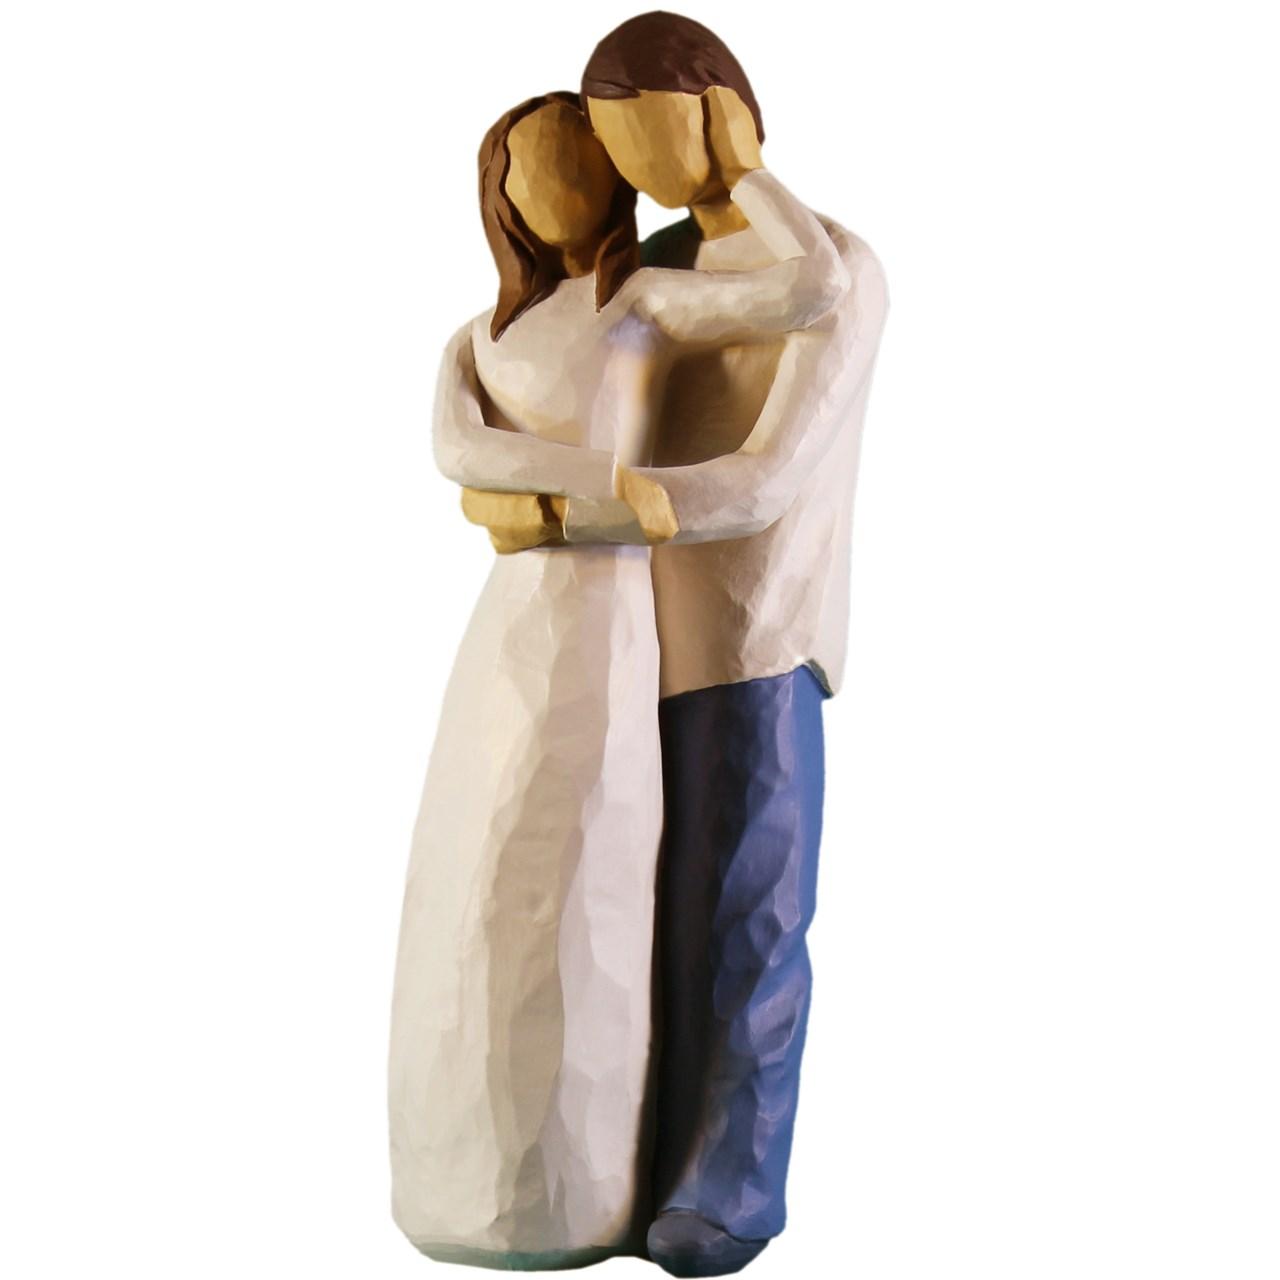 مجسمه امین کامپوزیت مدل همسر کد 22